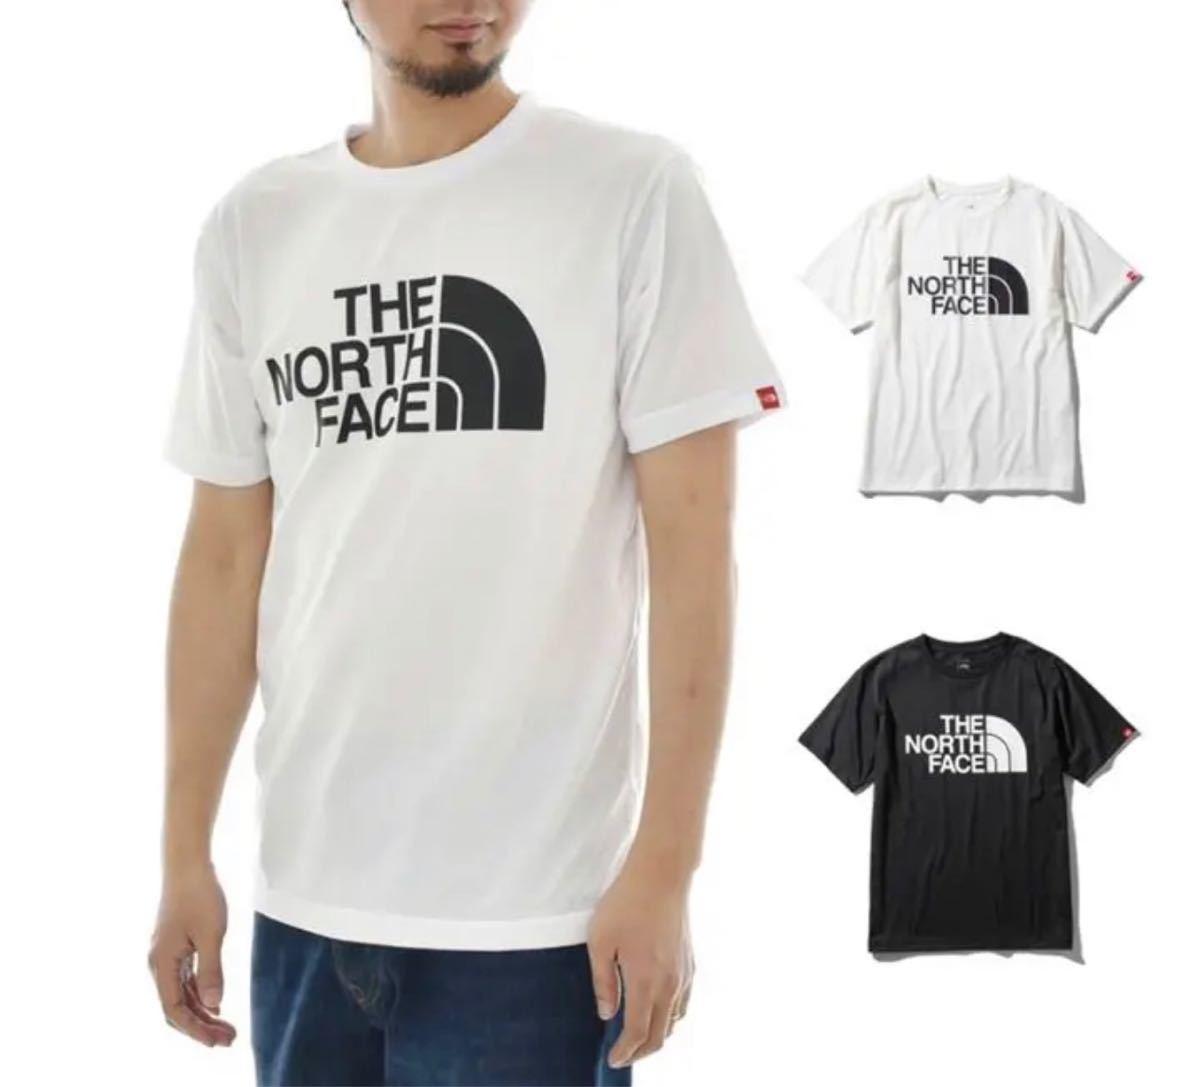 THE NORTH FACE ロゴTシャツ ザノースフェイス ビッグロゴ 半袖Tシャツ